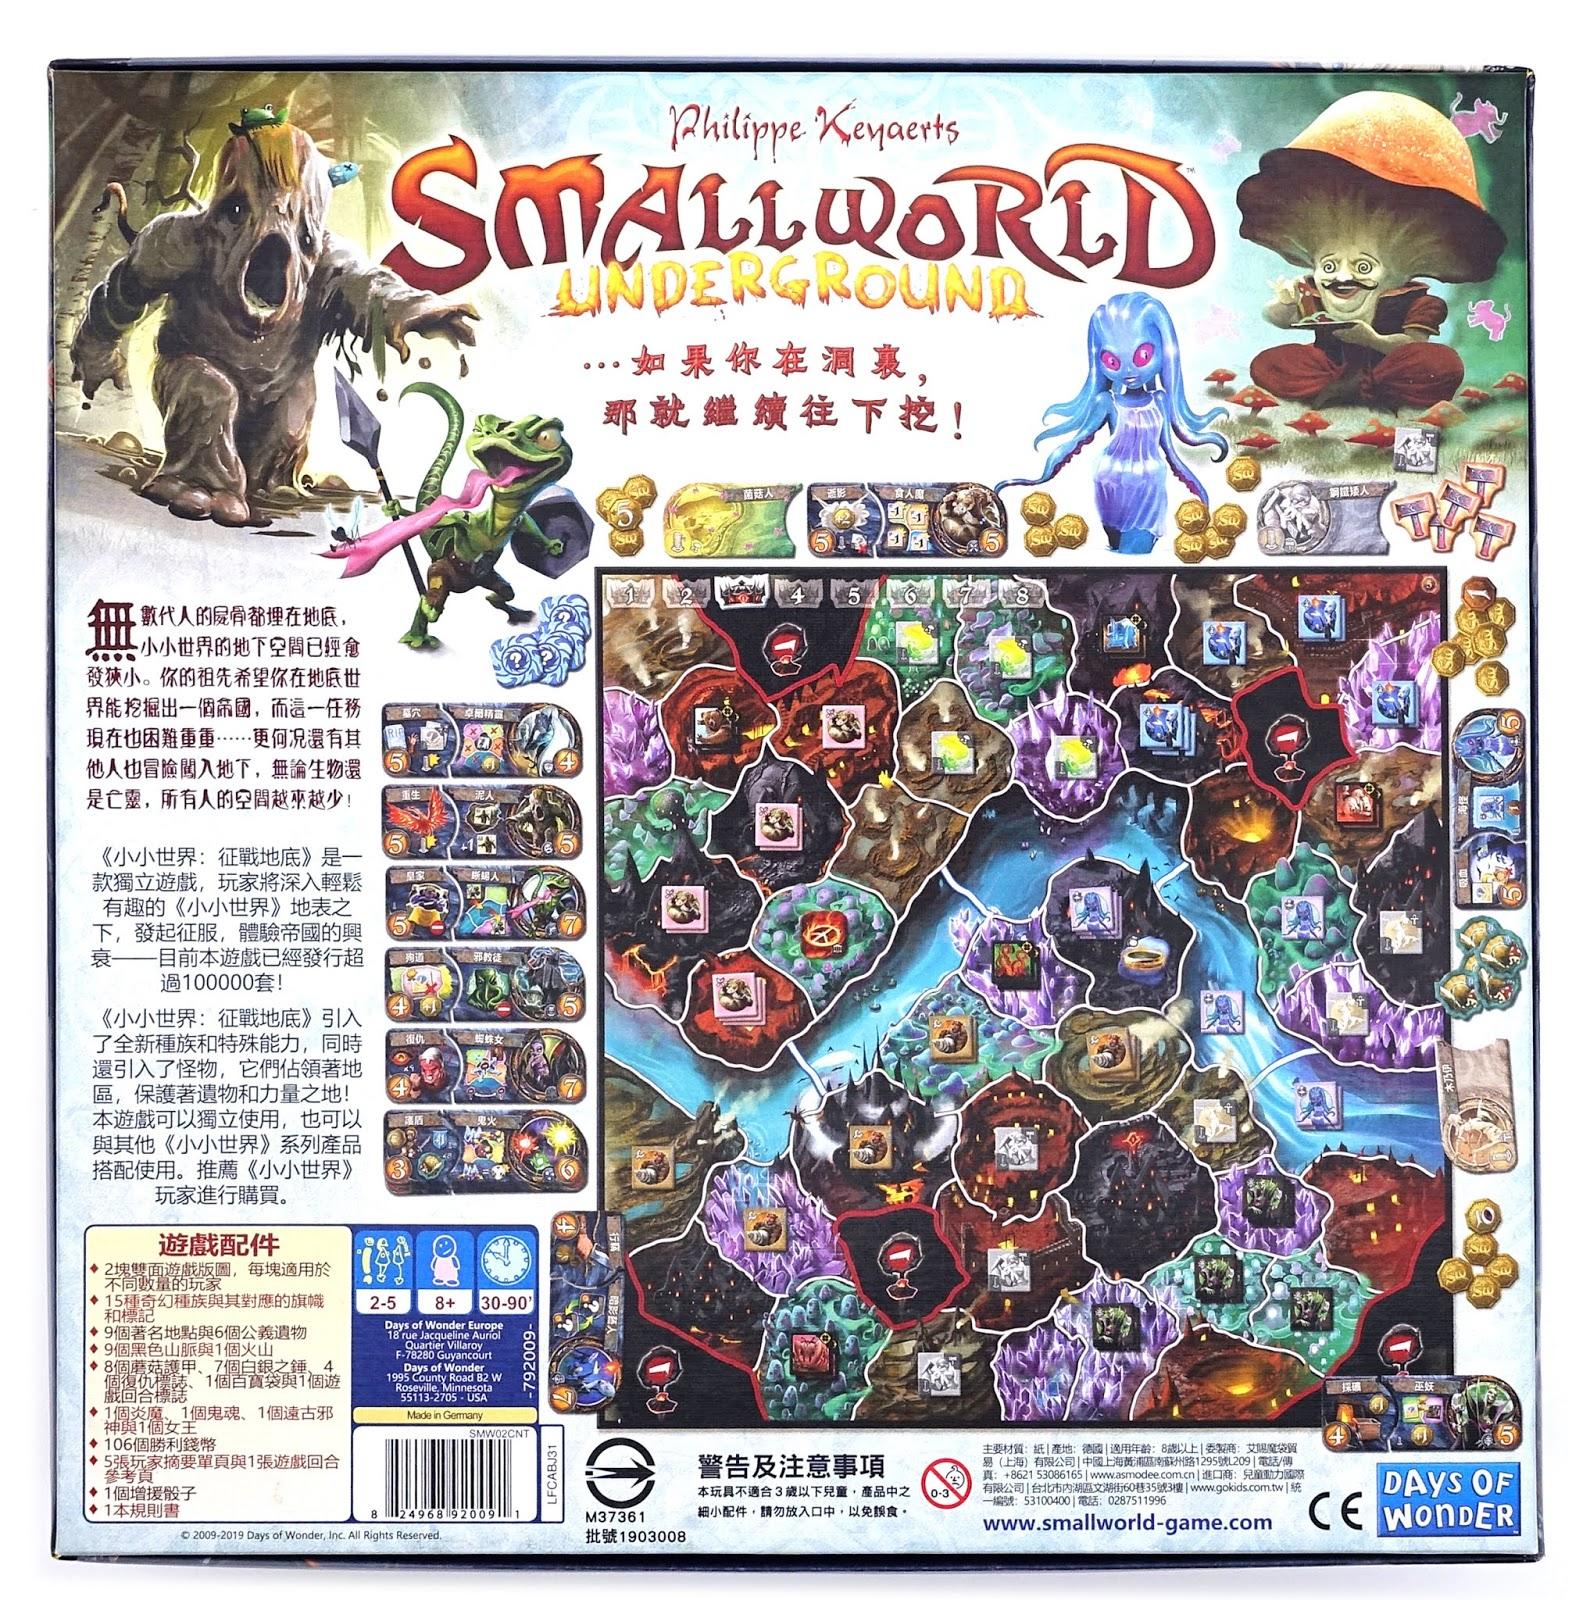 BoardSheep 小羊桌遊報: 【桌遊開箱報】Small World Underground 小小世界 征戰地底 簡易開箱